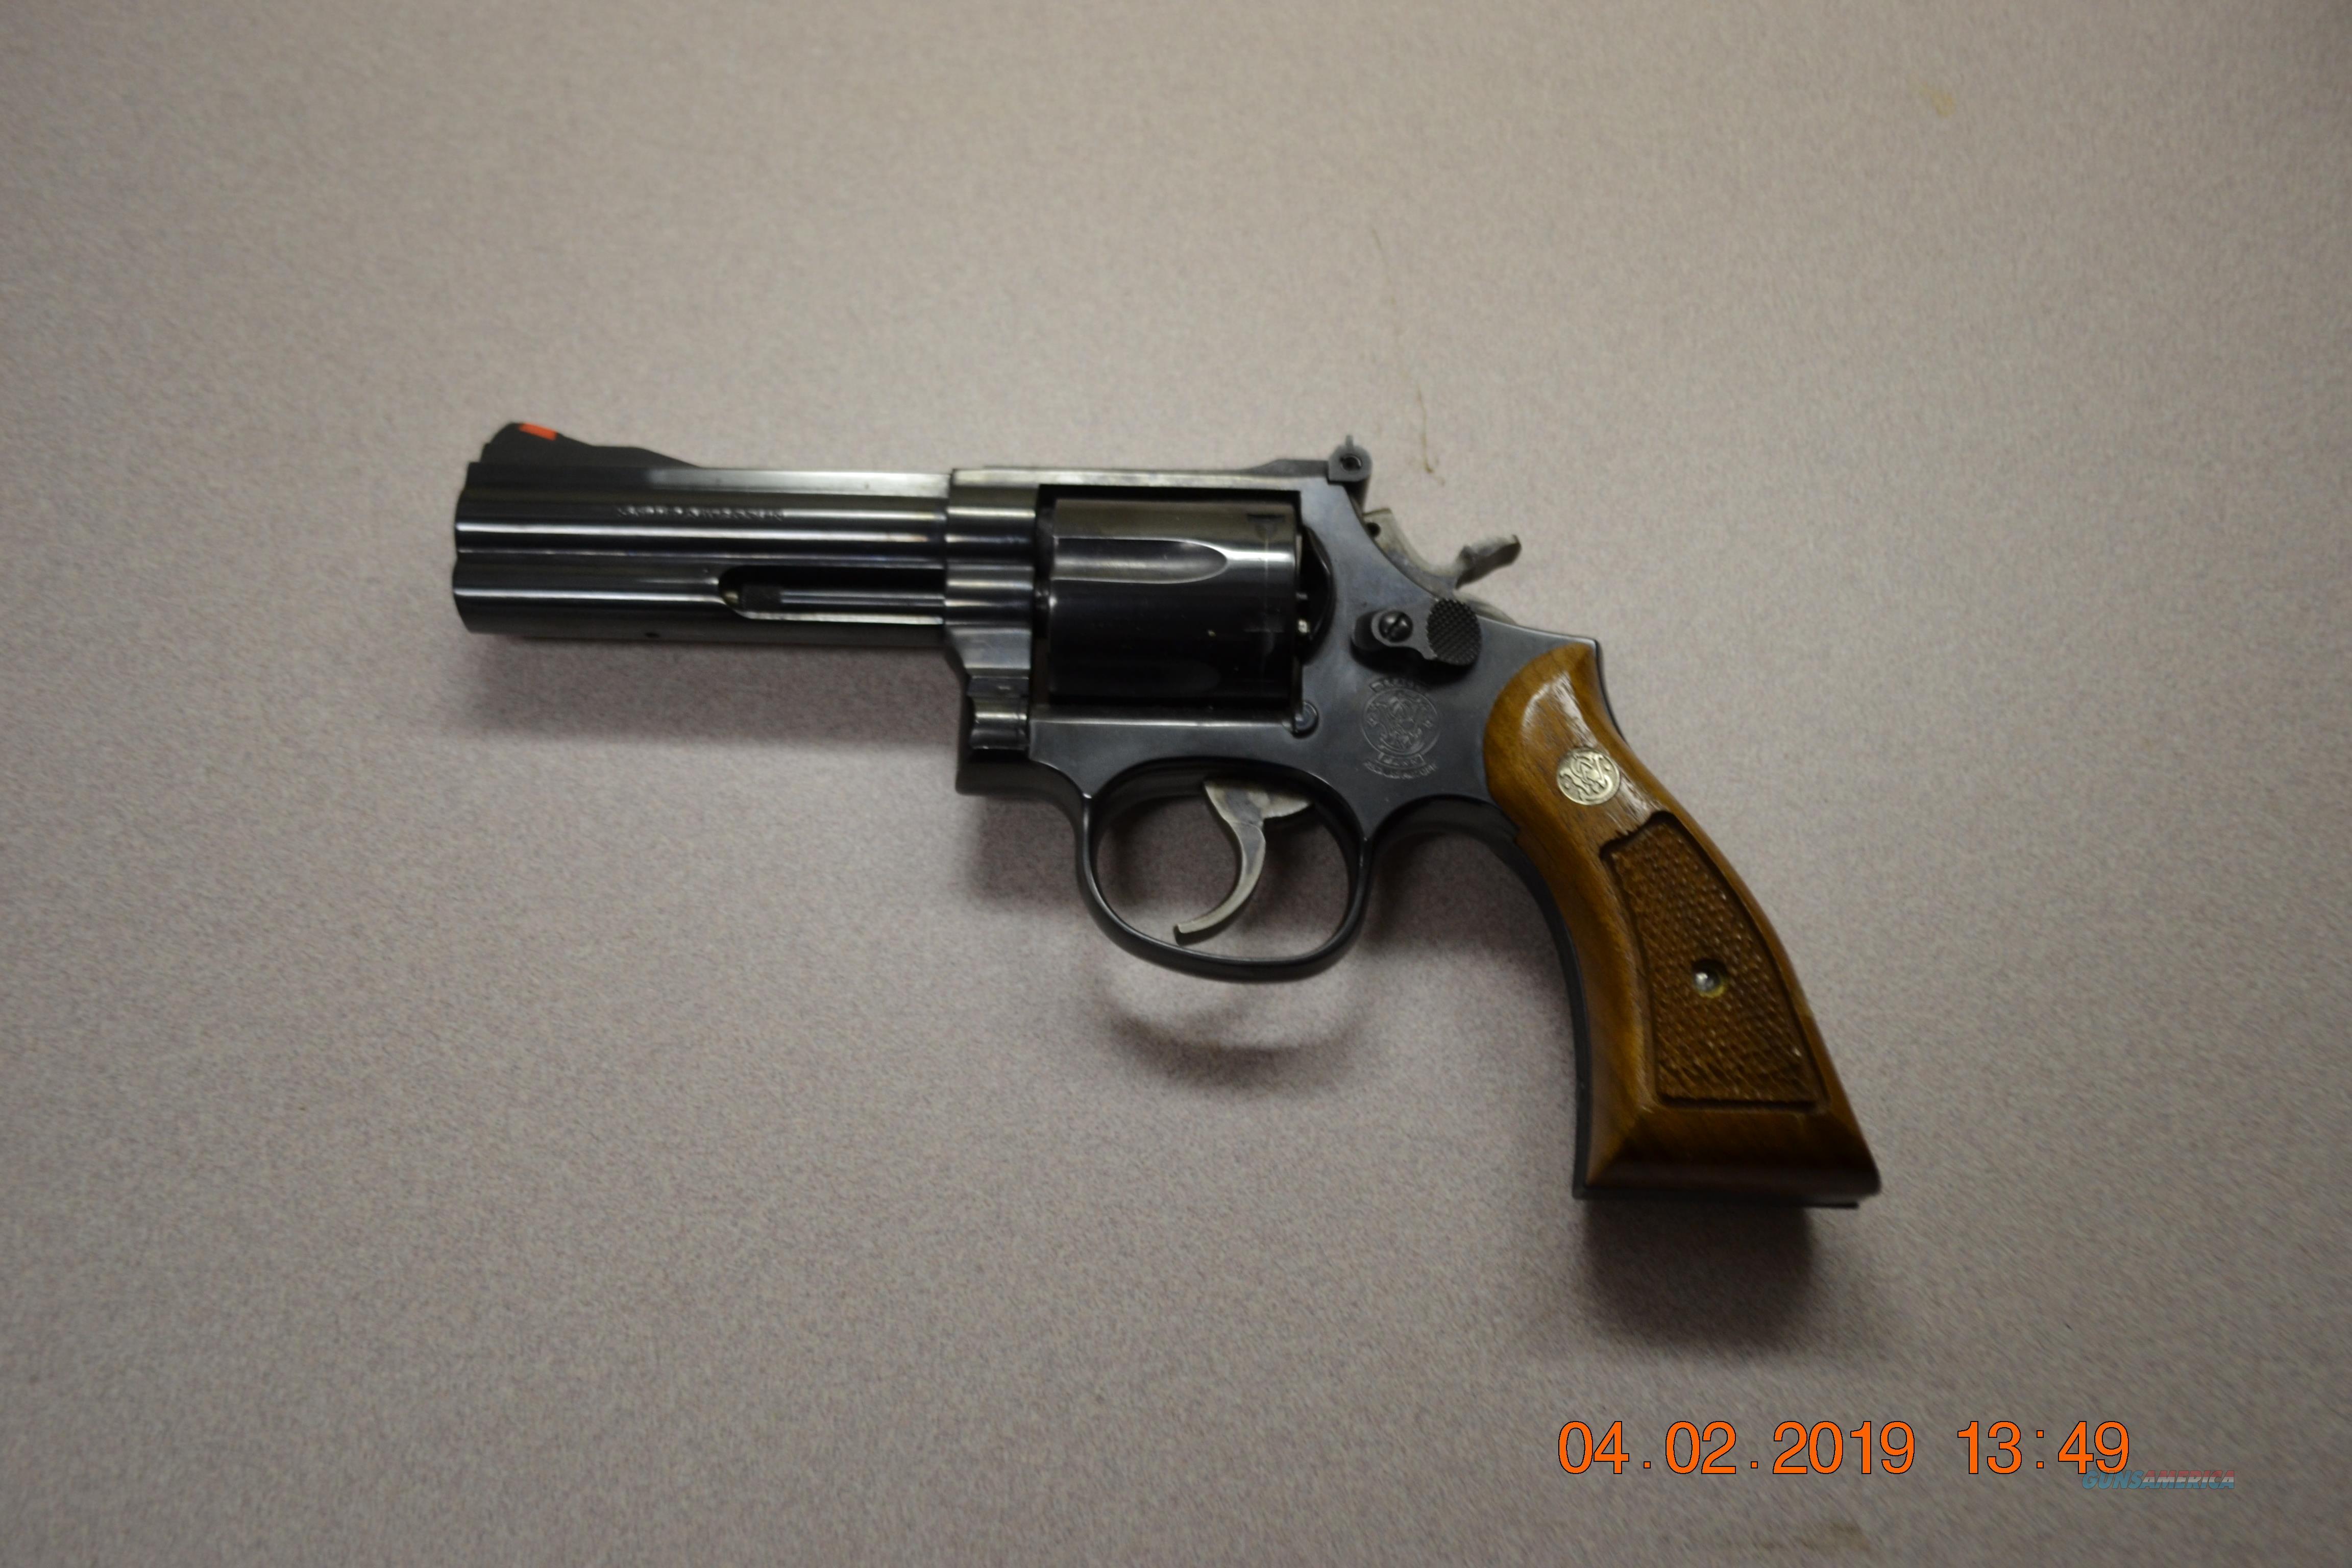 Smith & Wesson model 586-3  Guns > Pistols > Smith & Wesson Revolvers > Med. Frame ( K/L )